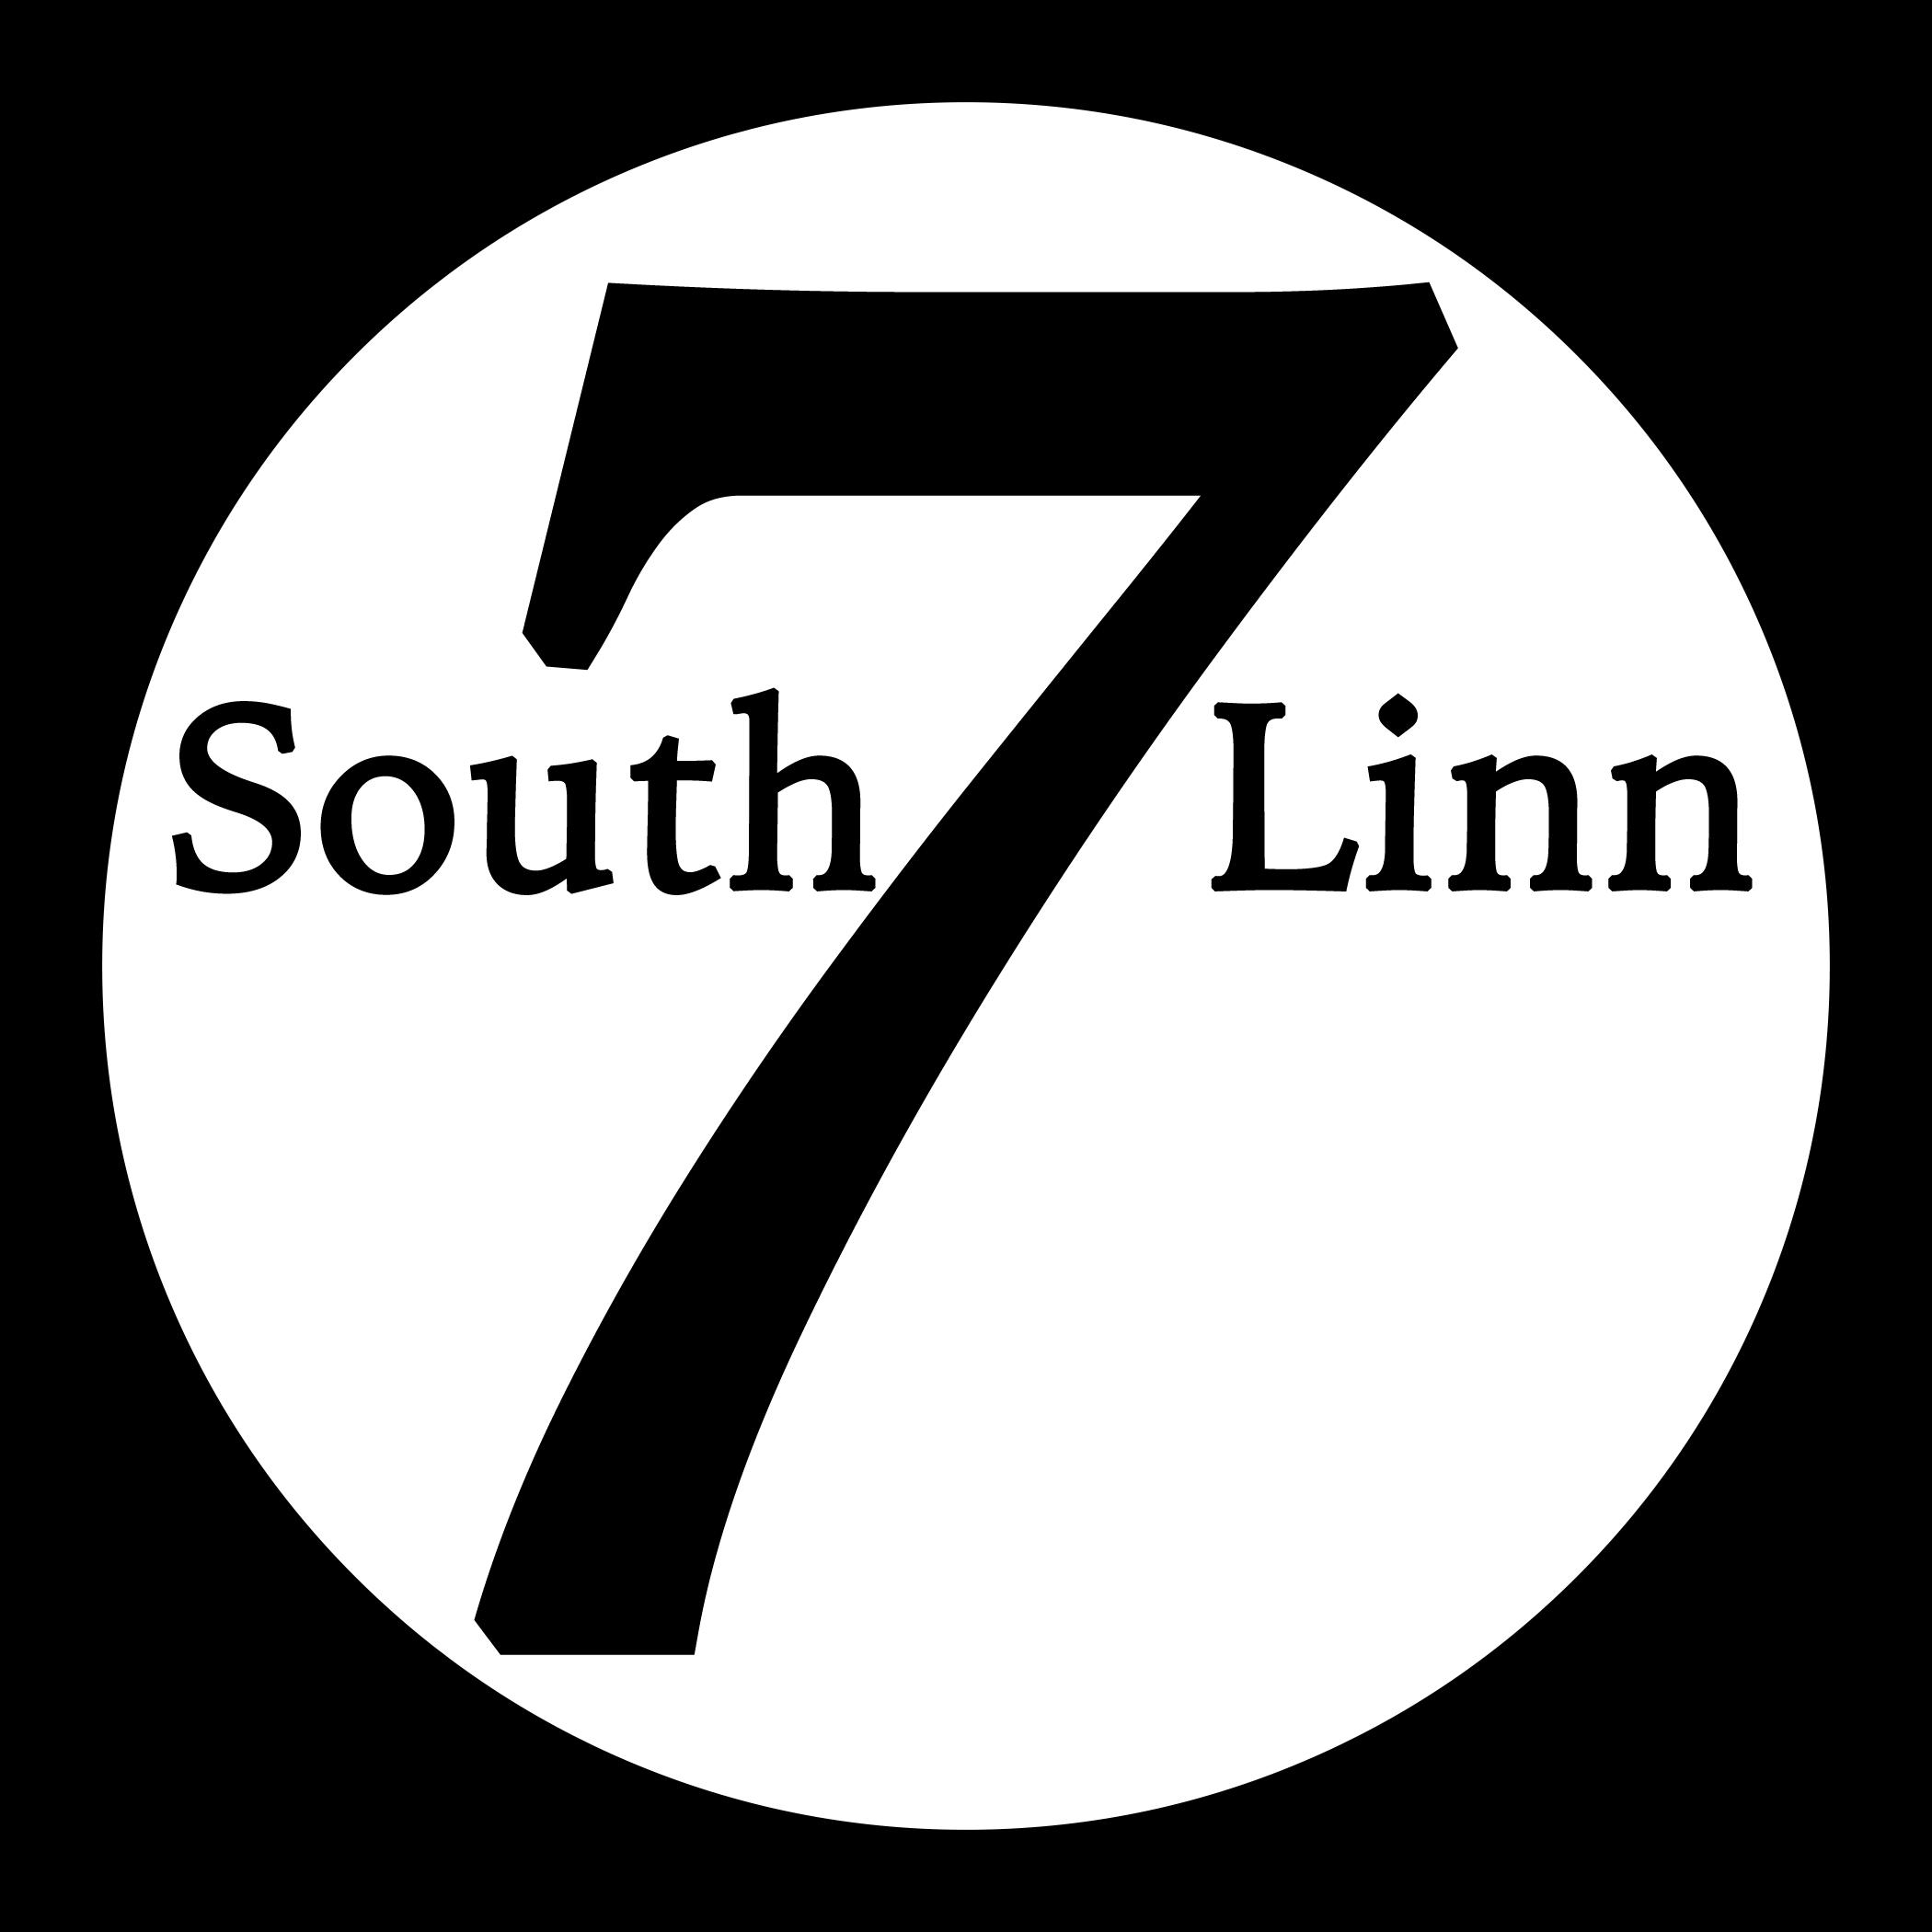 7 South Linn